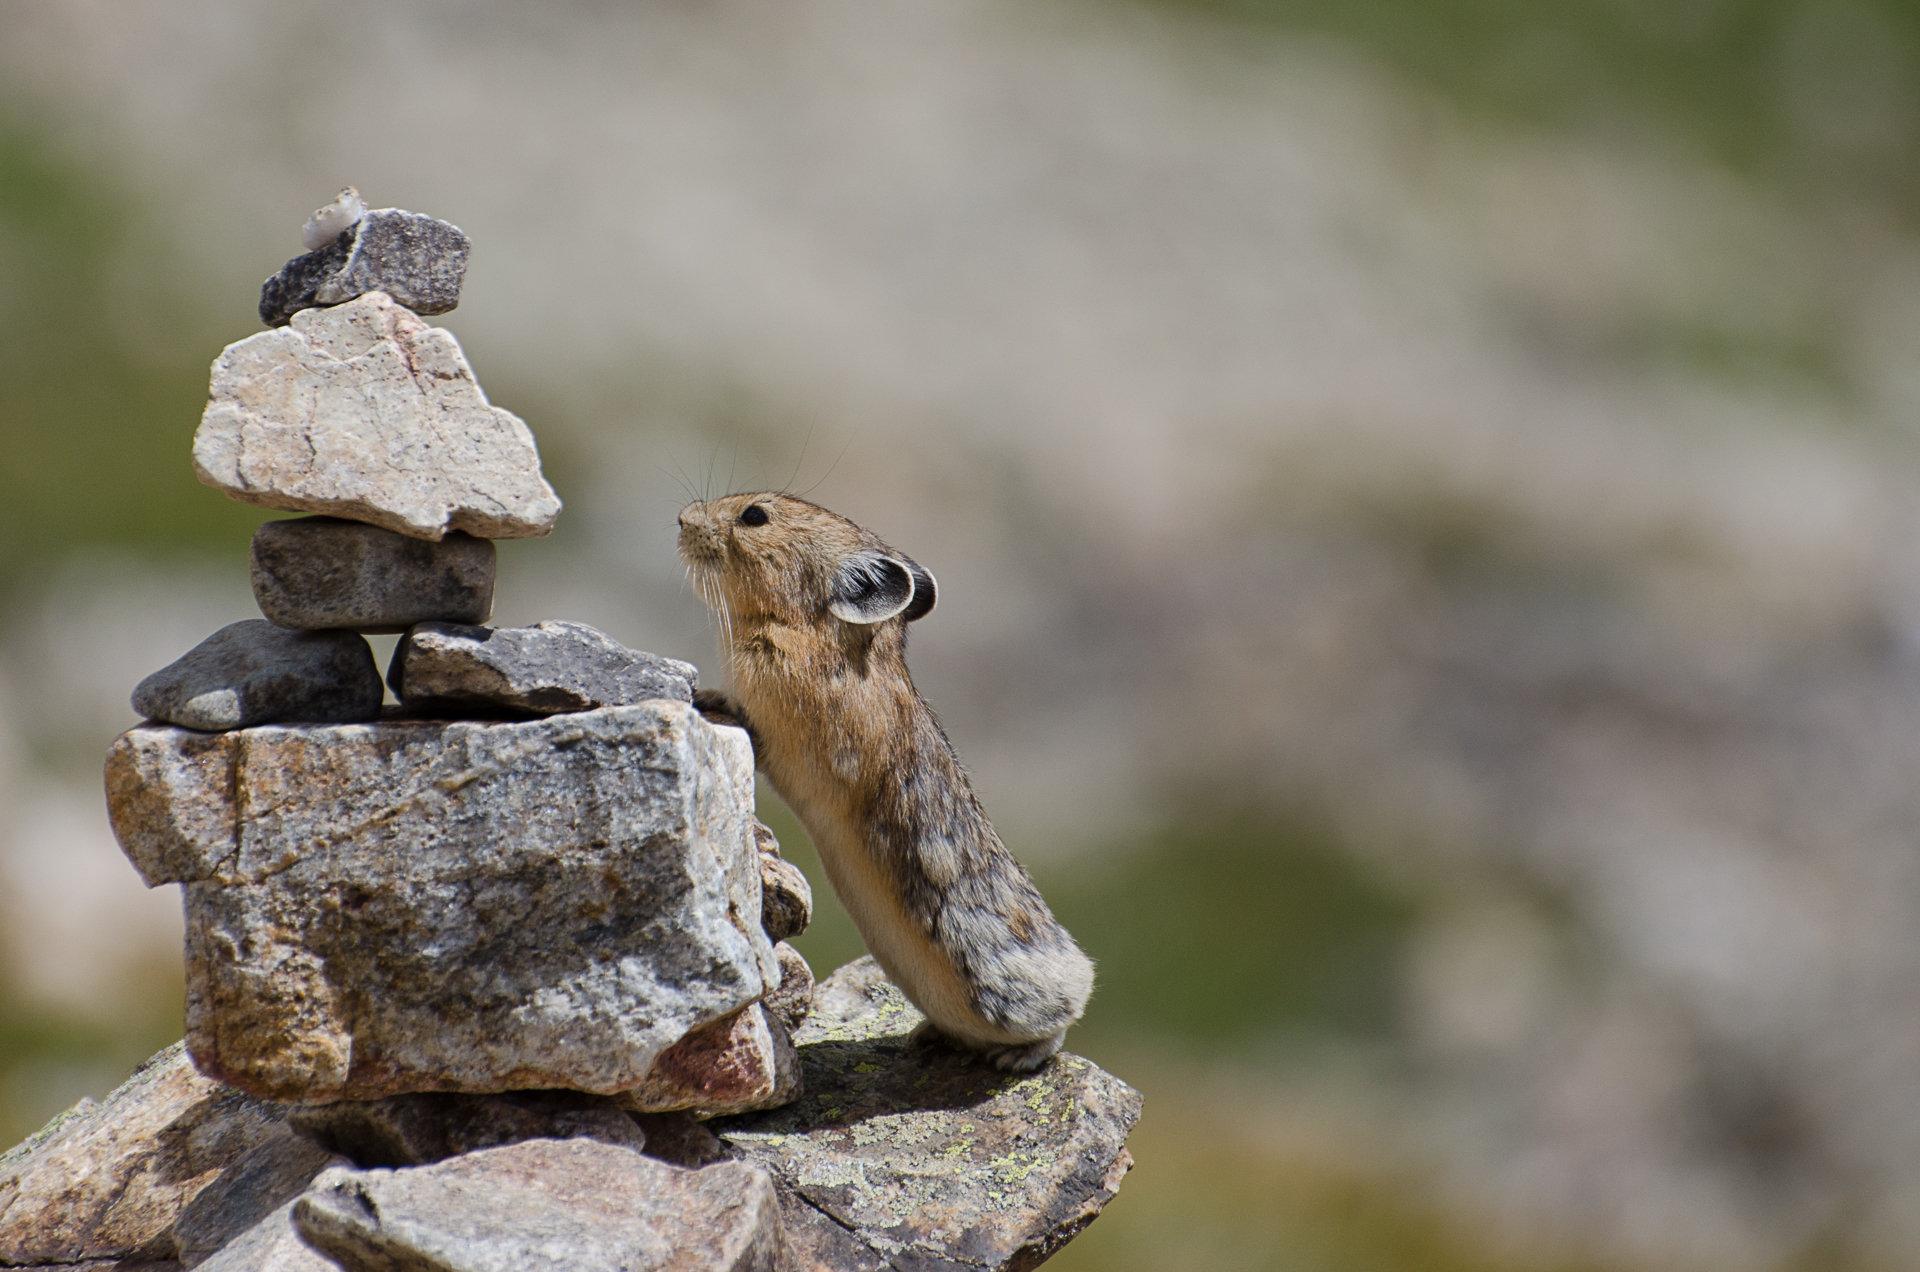 PICT - 2016 Winning Photo - Colorado Parks and Wildlife